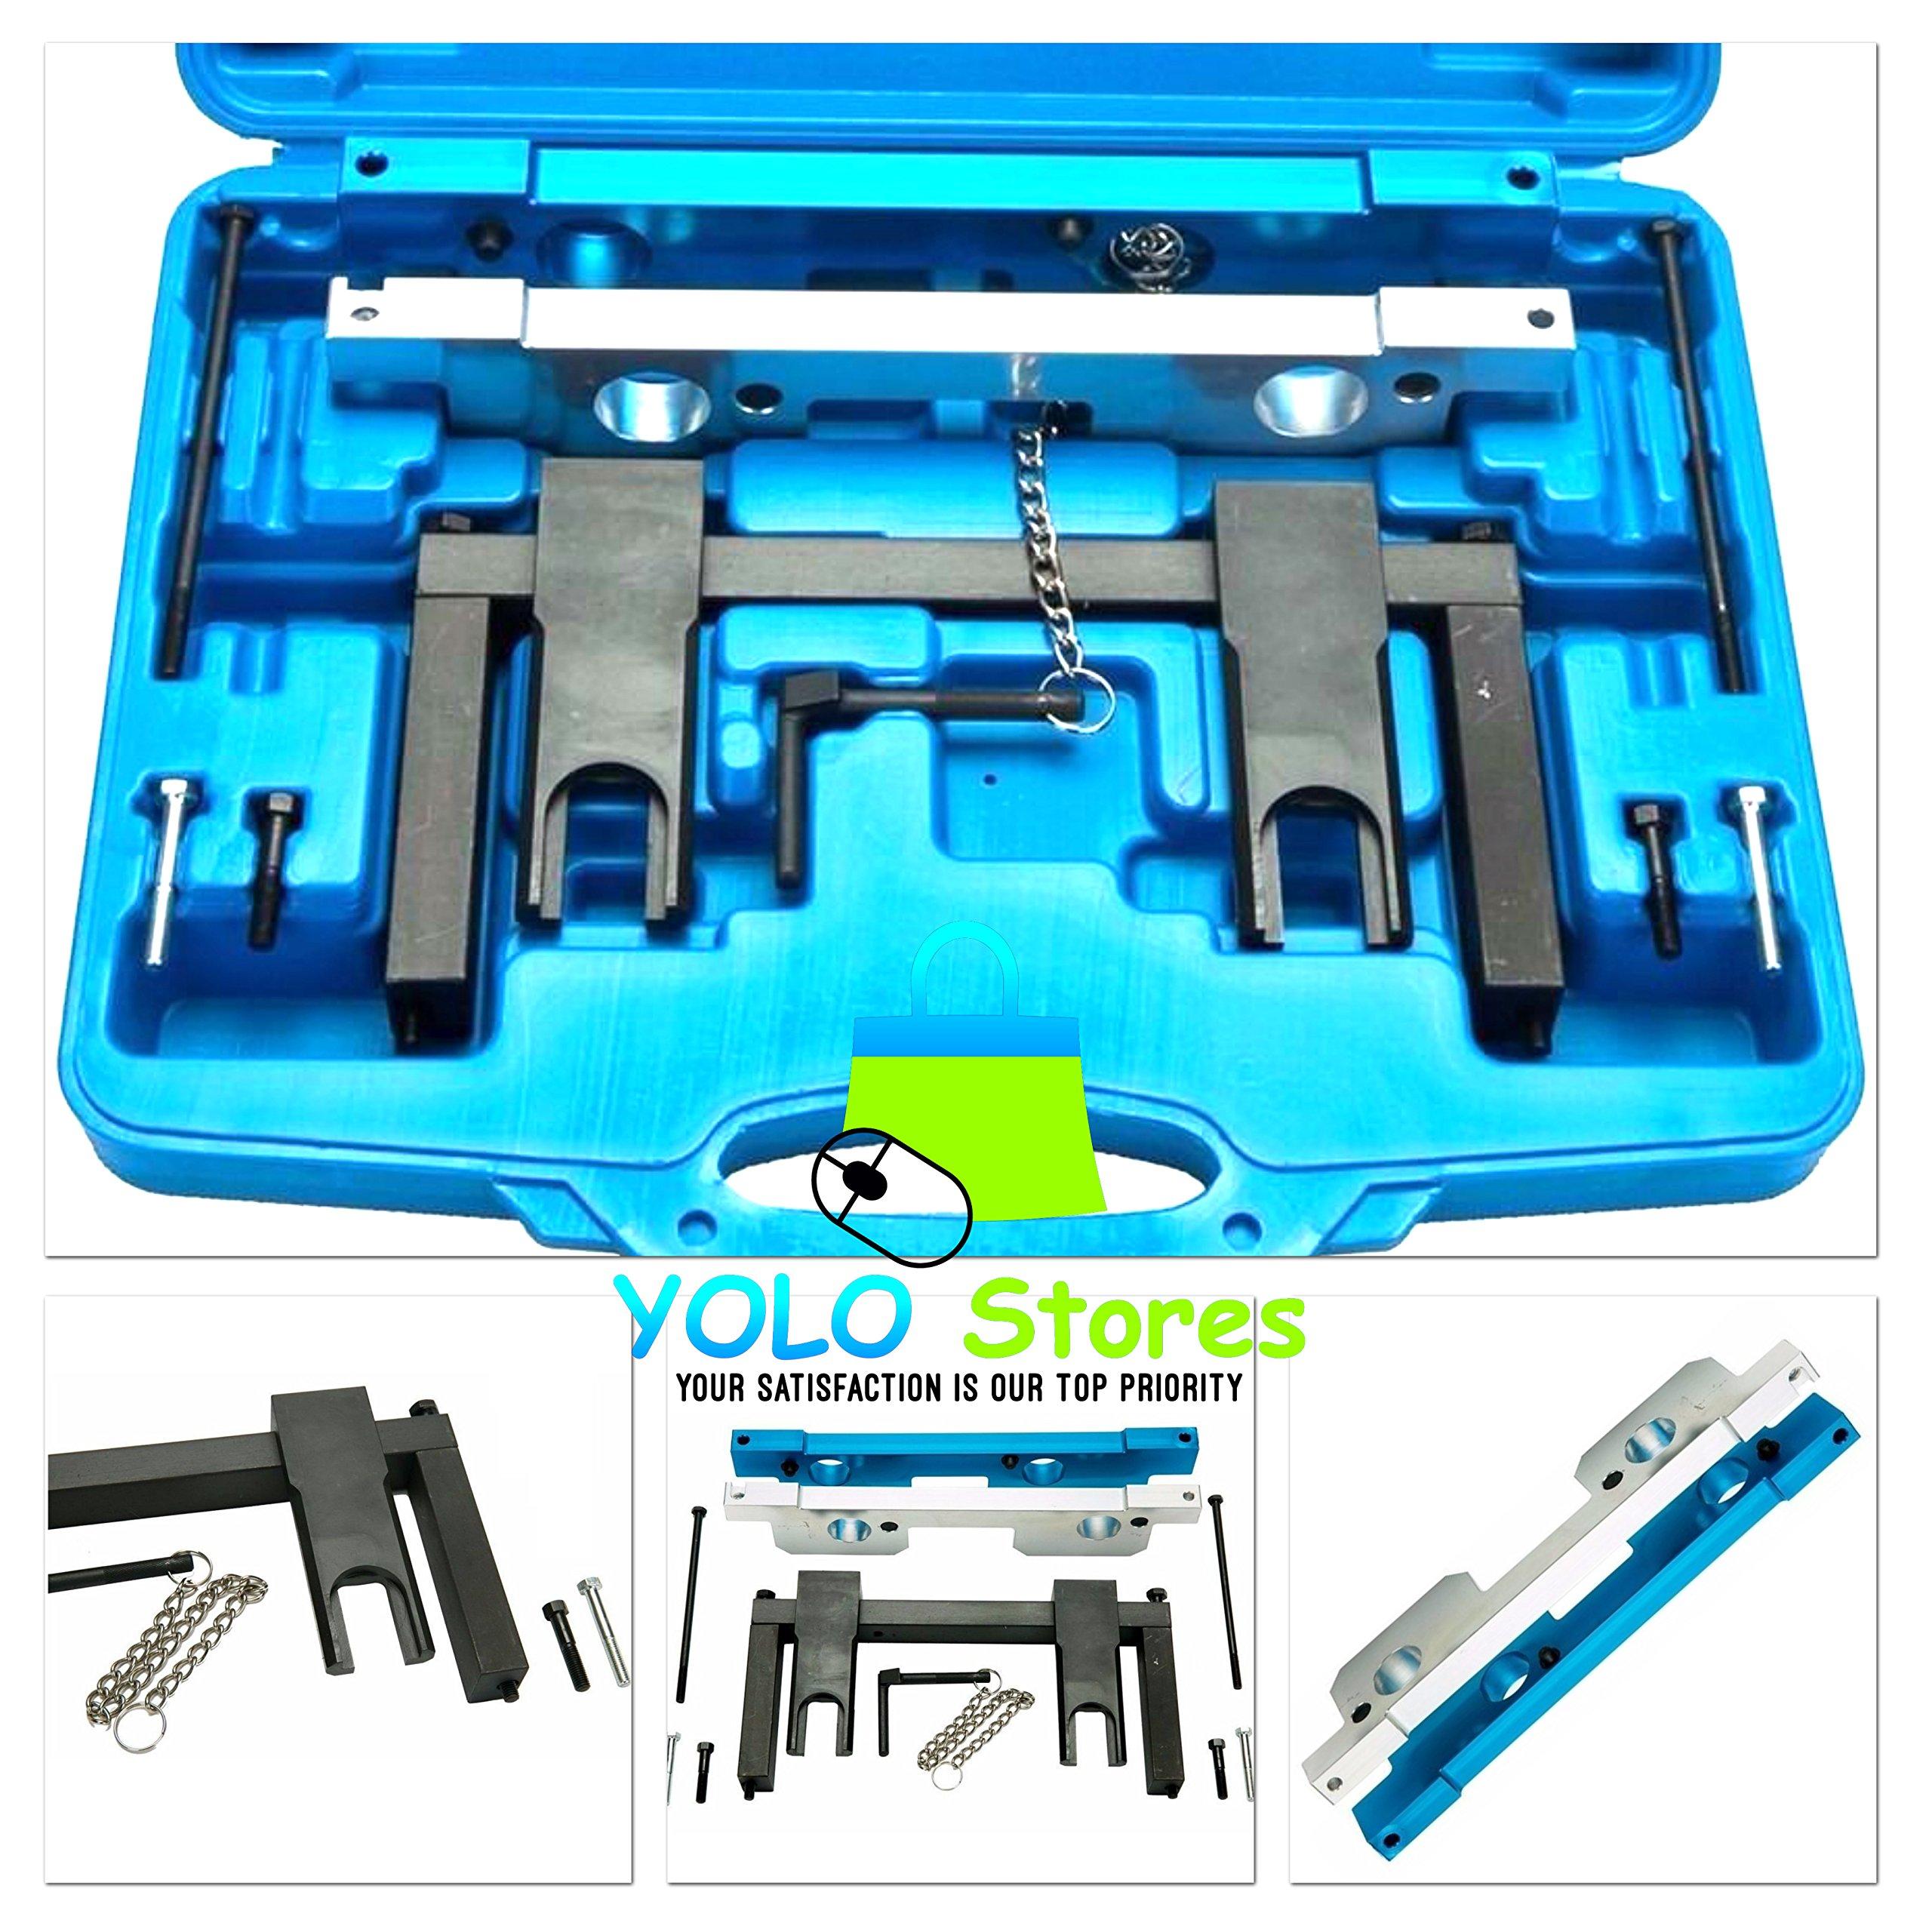 Camshaft Alignment Timing Tool Kit Engine Tools Set Vanos Plates For BMW N51/N52/N53/N54 By YOLO Stores